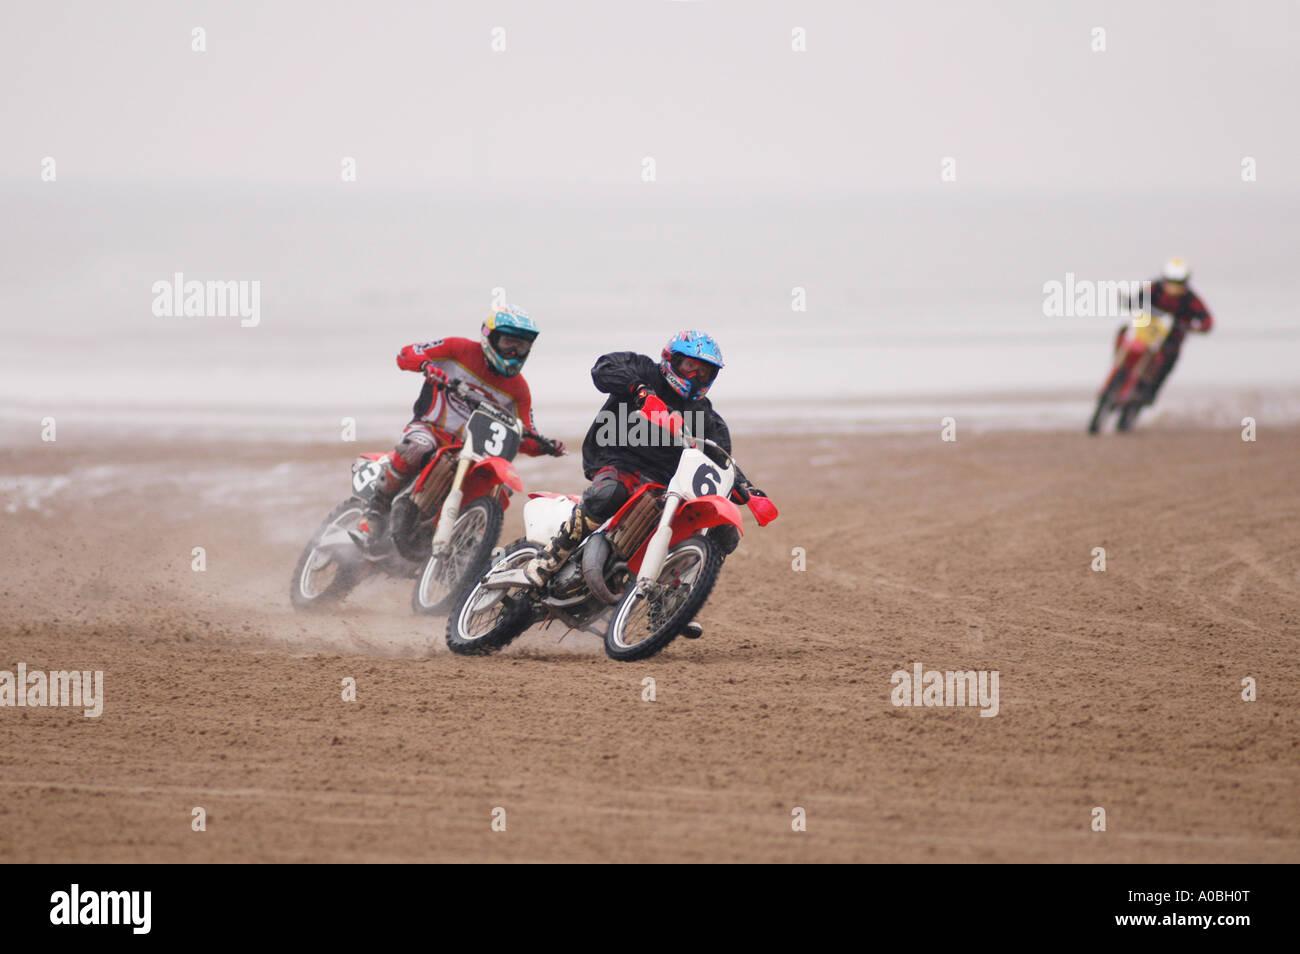 Motorbike Sand Racing On A Beach In England Stock Photo Alamy